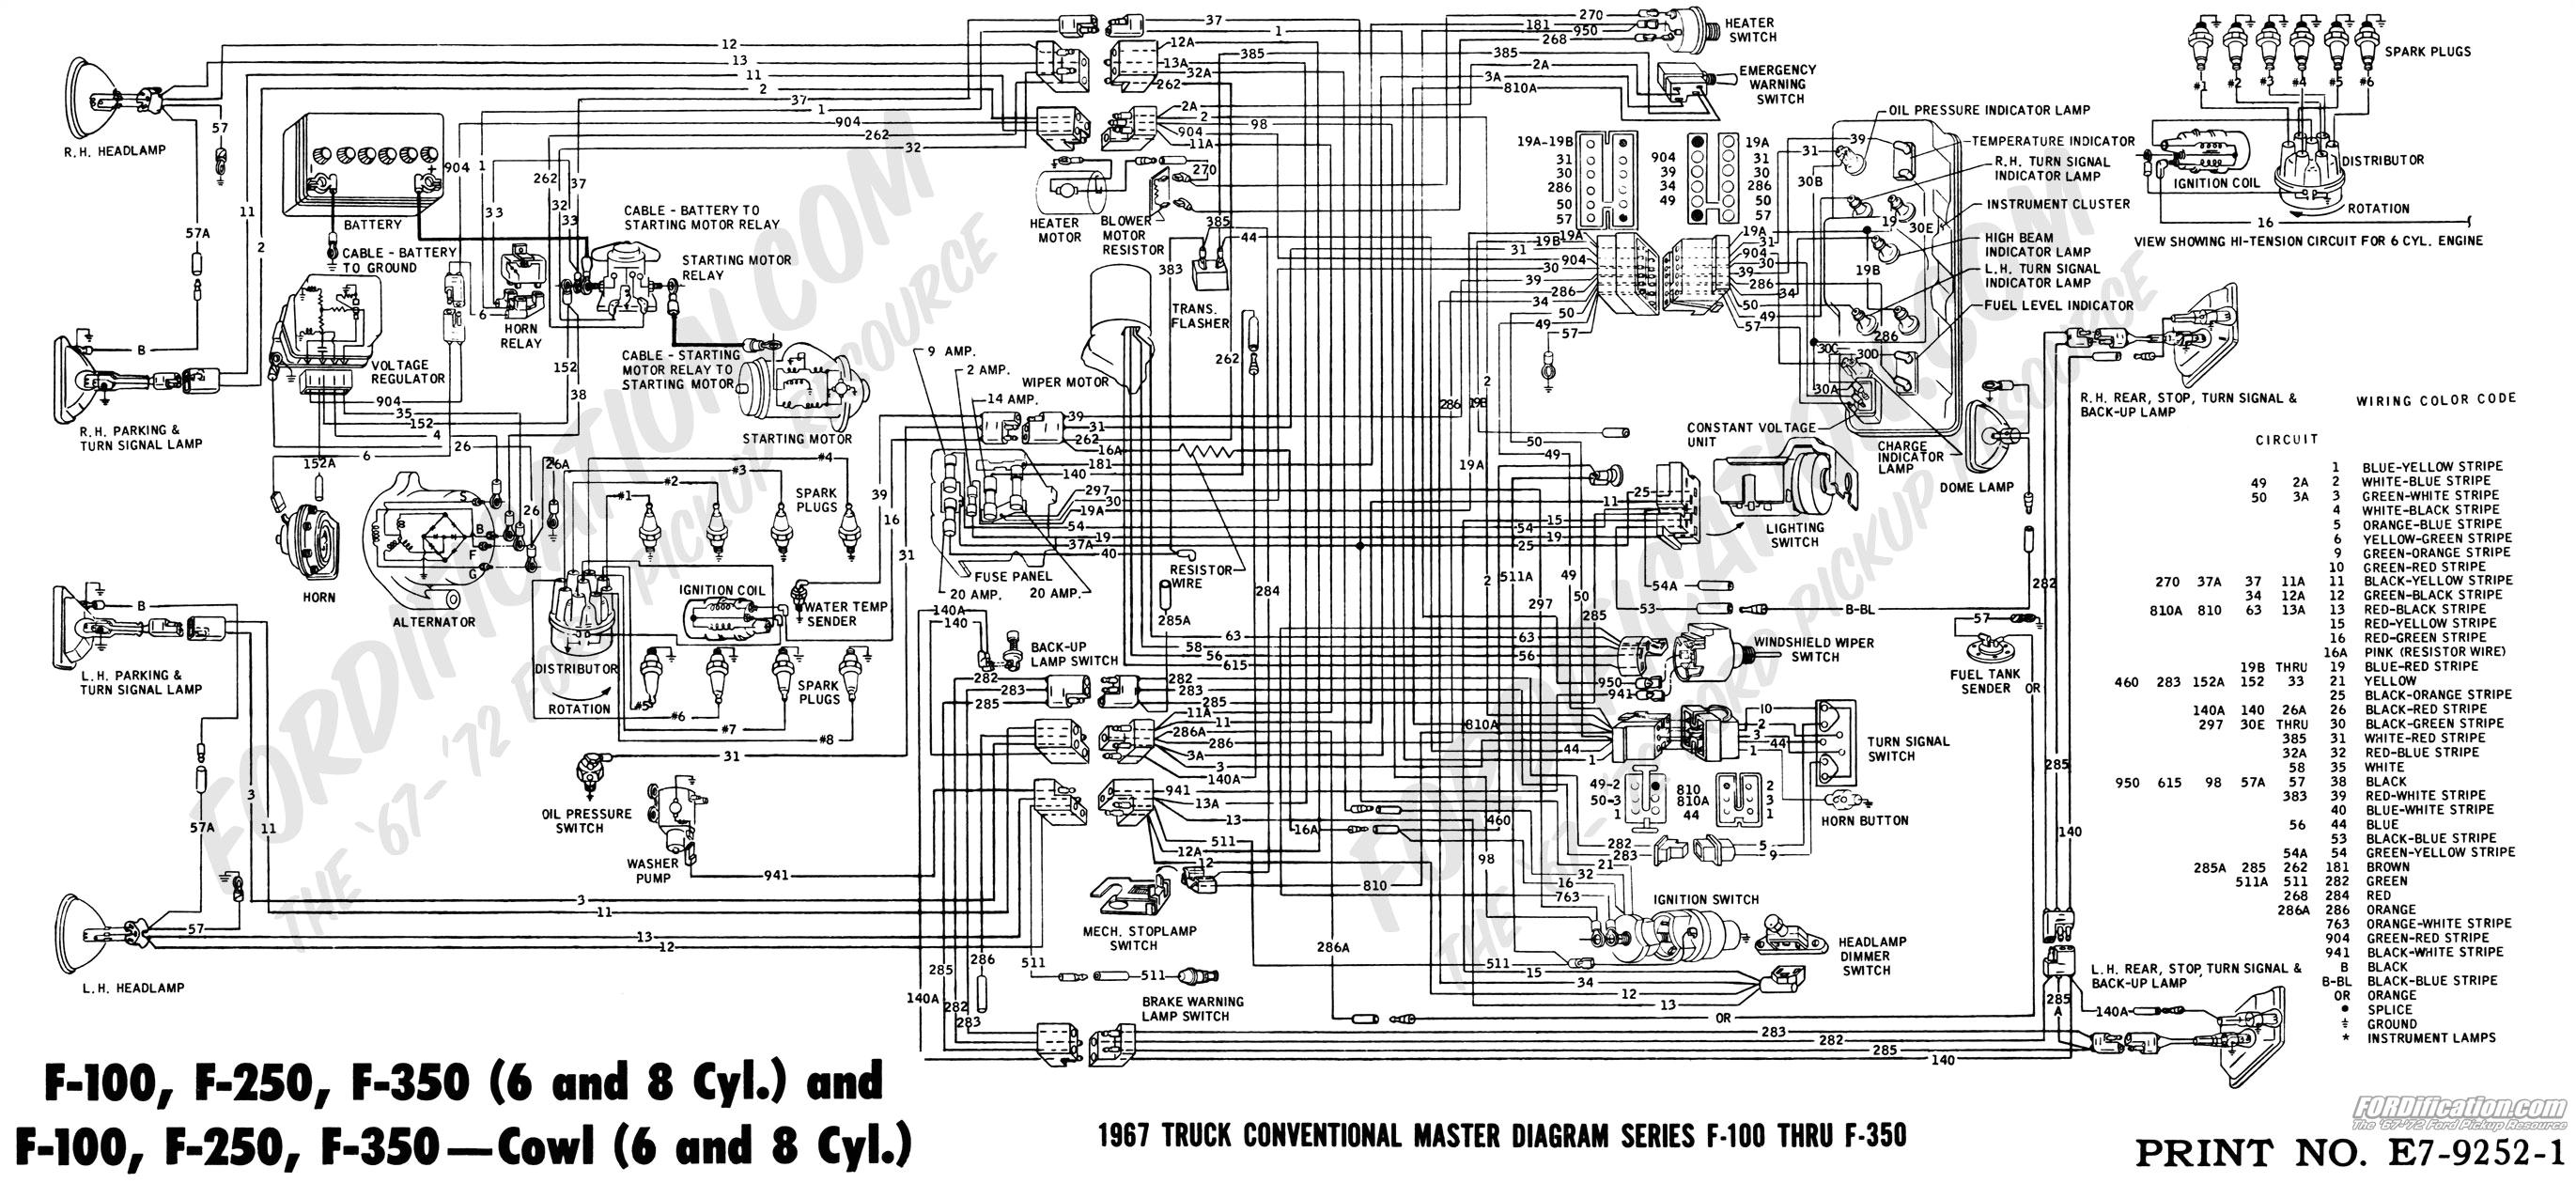 1994 ford e350 wiring diagram wiring diagrams recent 1994 e350 wiring diagram